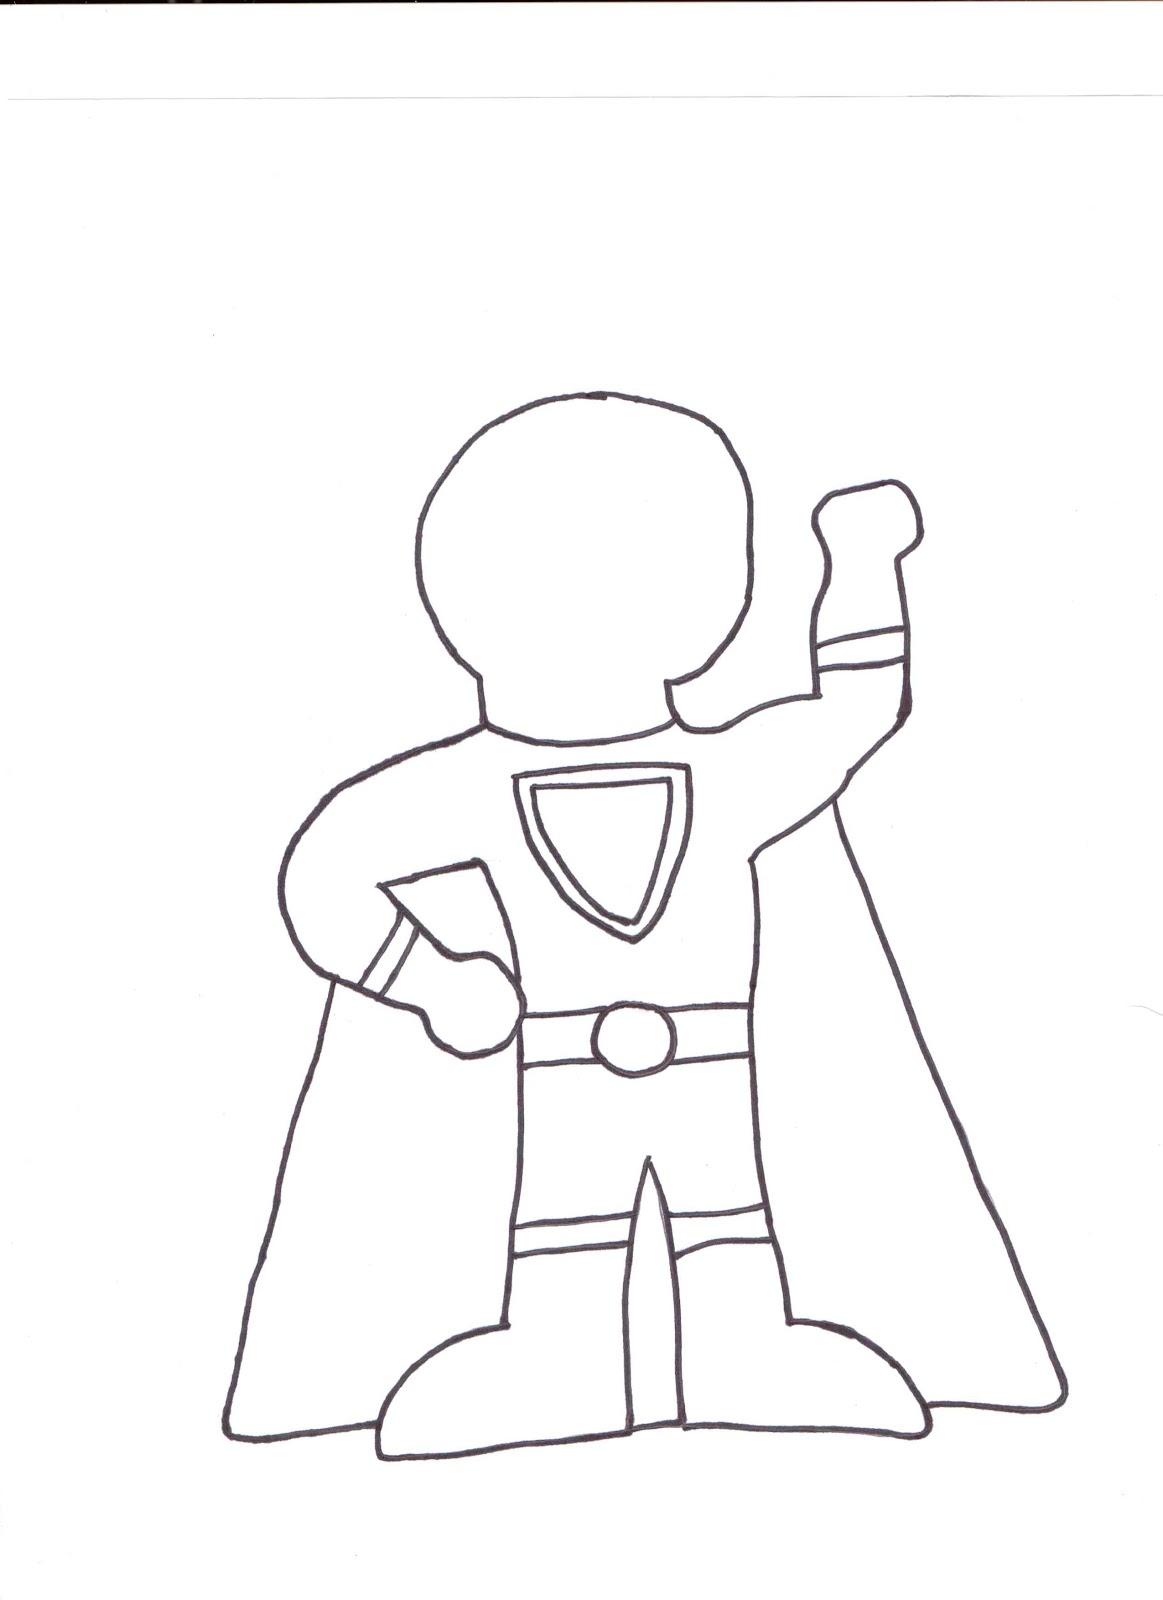 Superhero Kid Template drawing free image